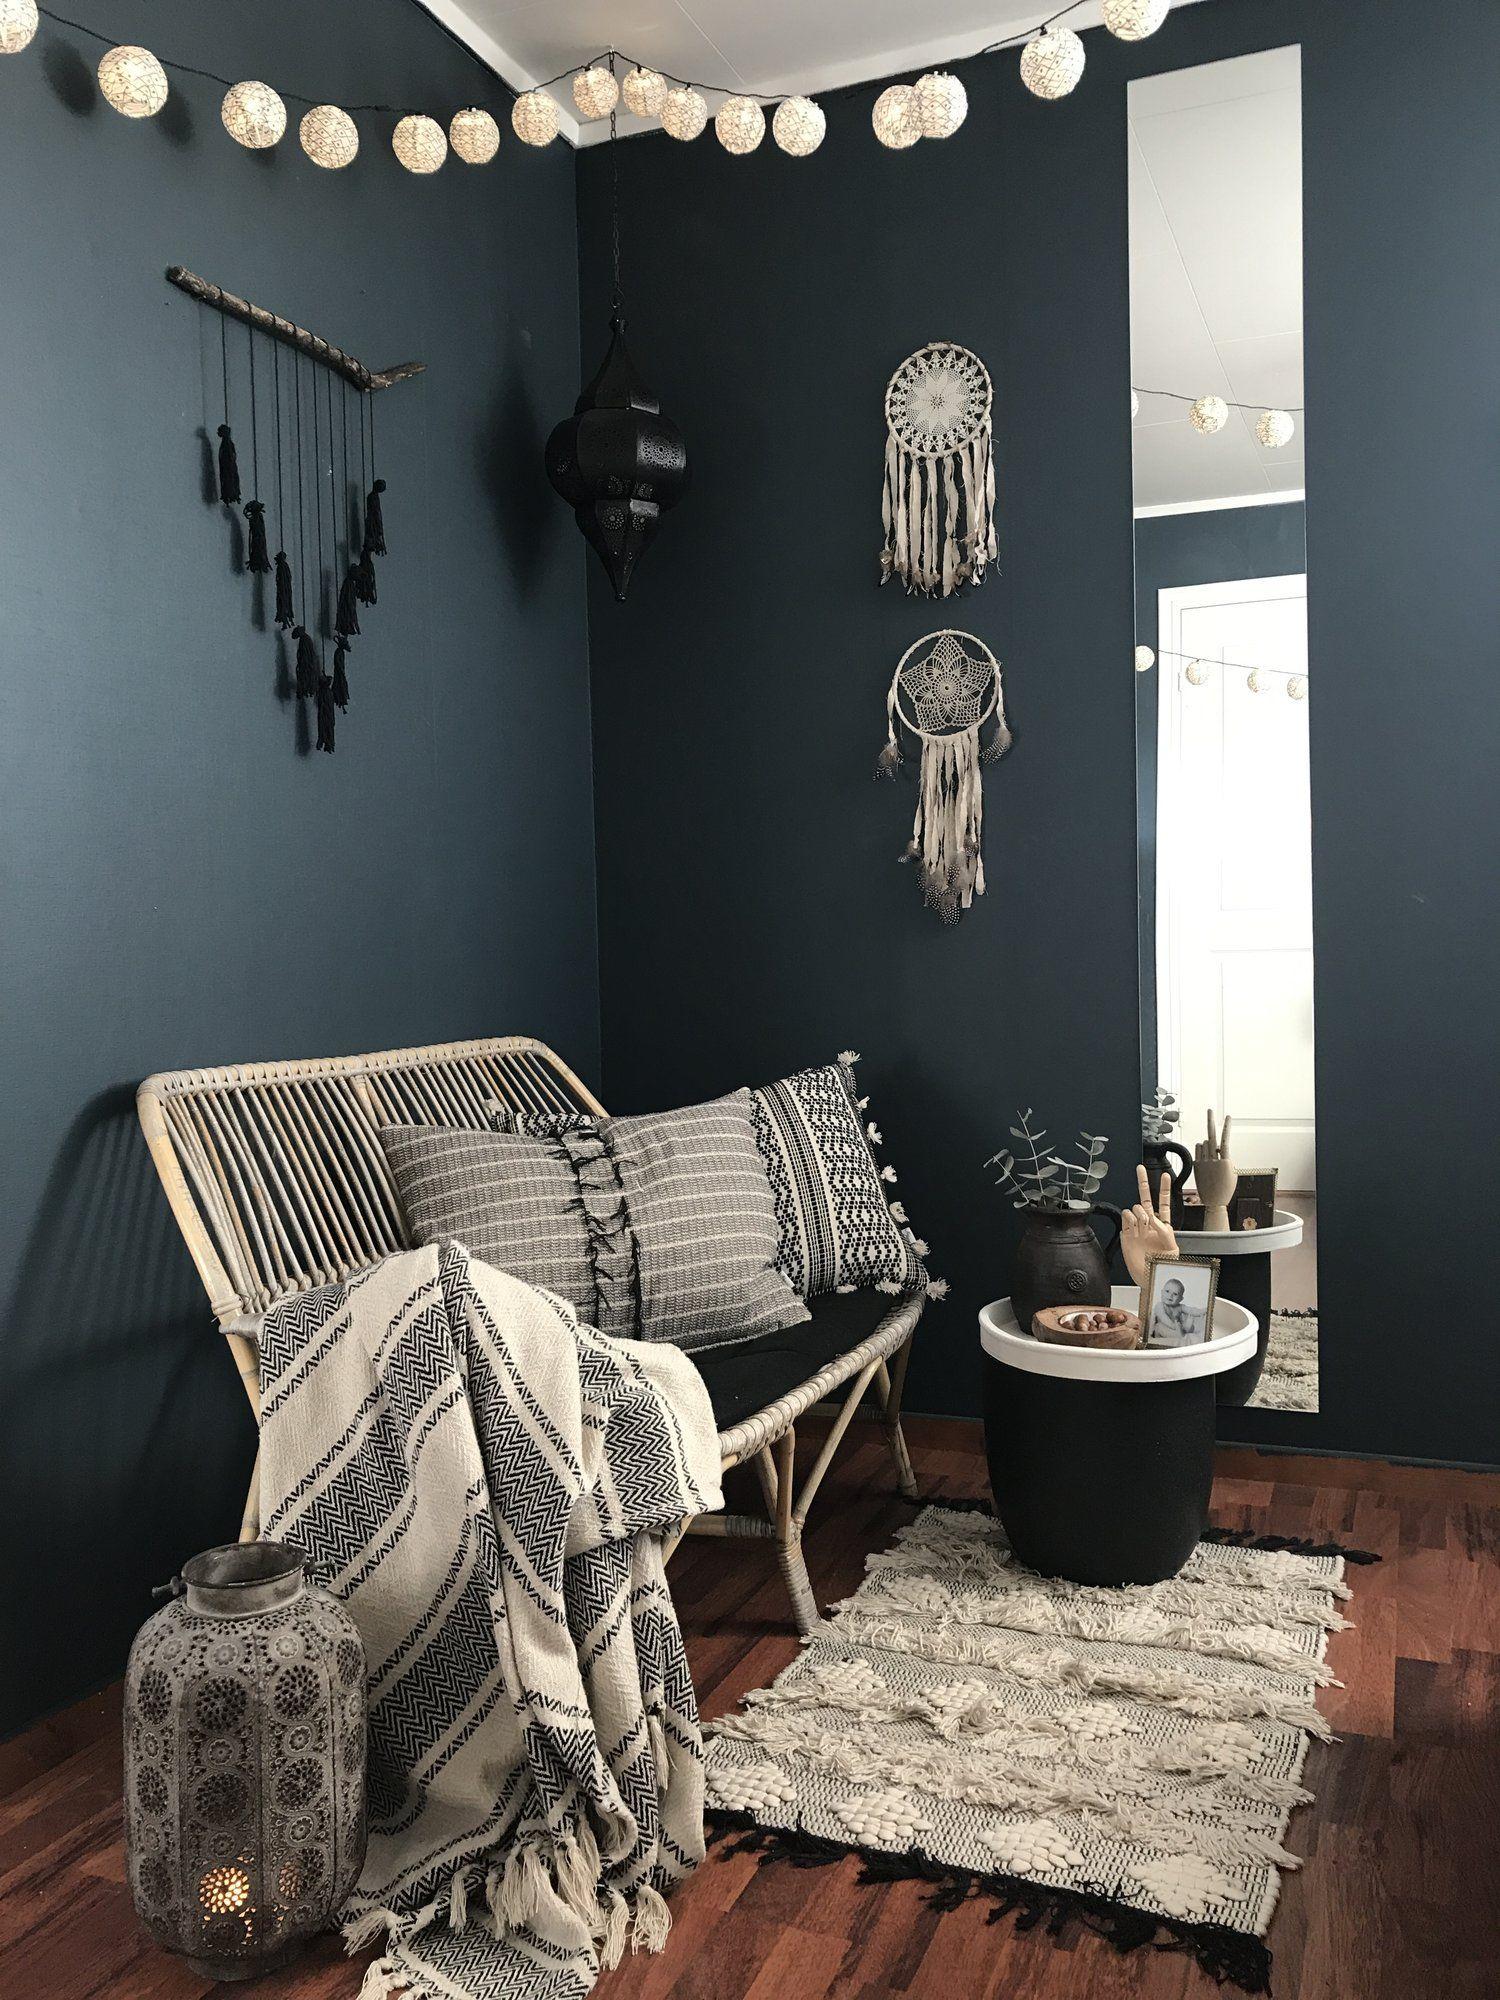 10 Blue Living Room Ideas That Make An Unforgettable Statement